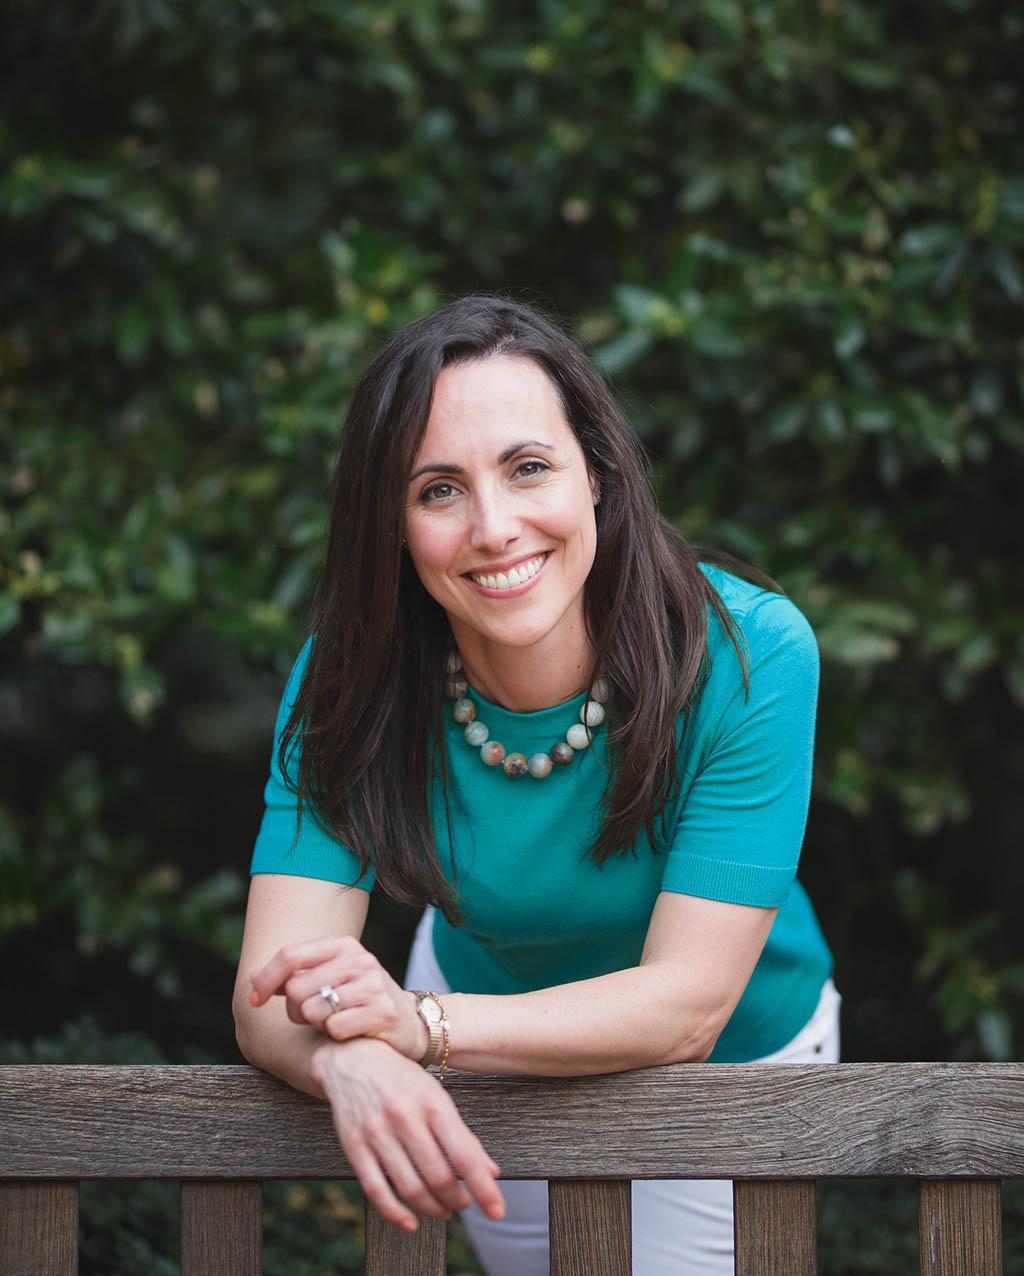 Lauren Zangardi Haynes is a CIMA®, CFP® who is a Fee-Only Financial Advisor in Richmond & Williamsburg Virginia